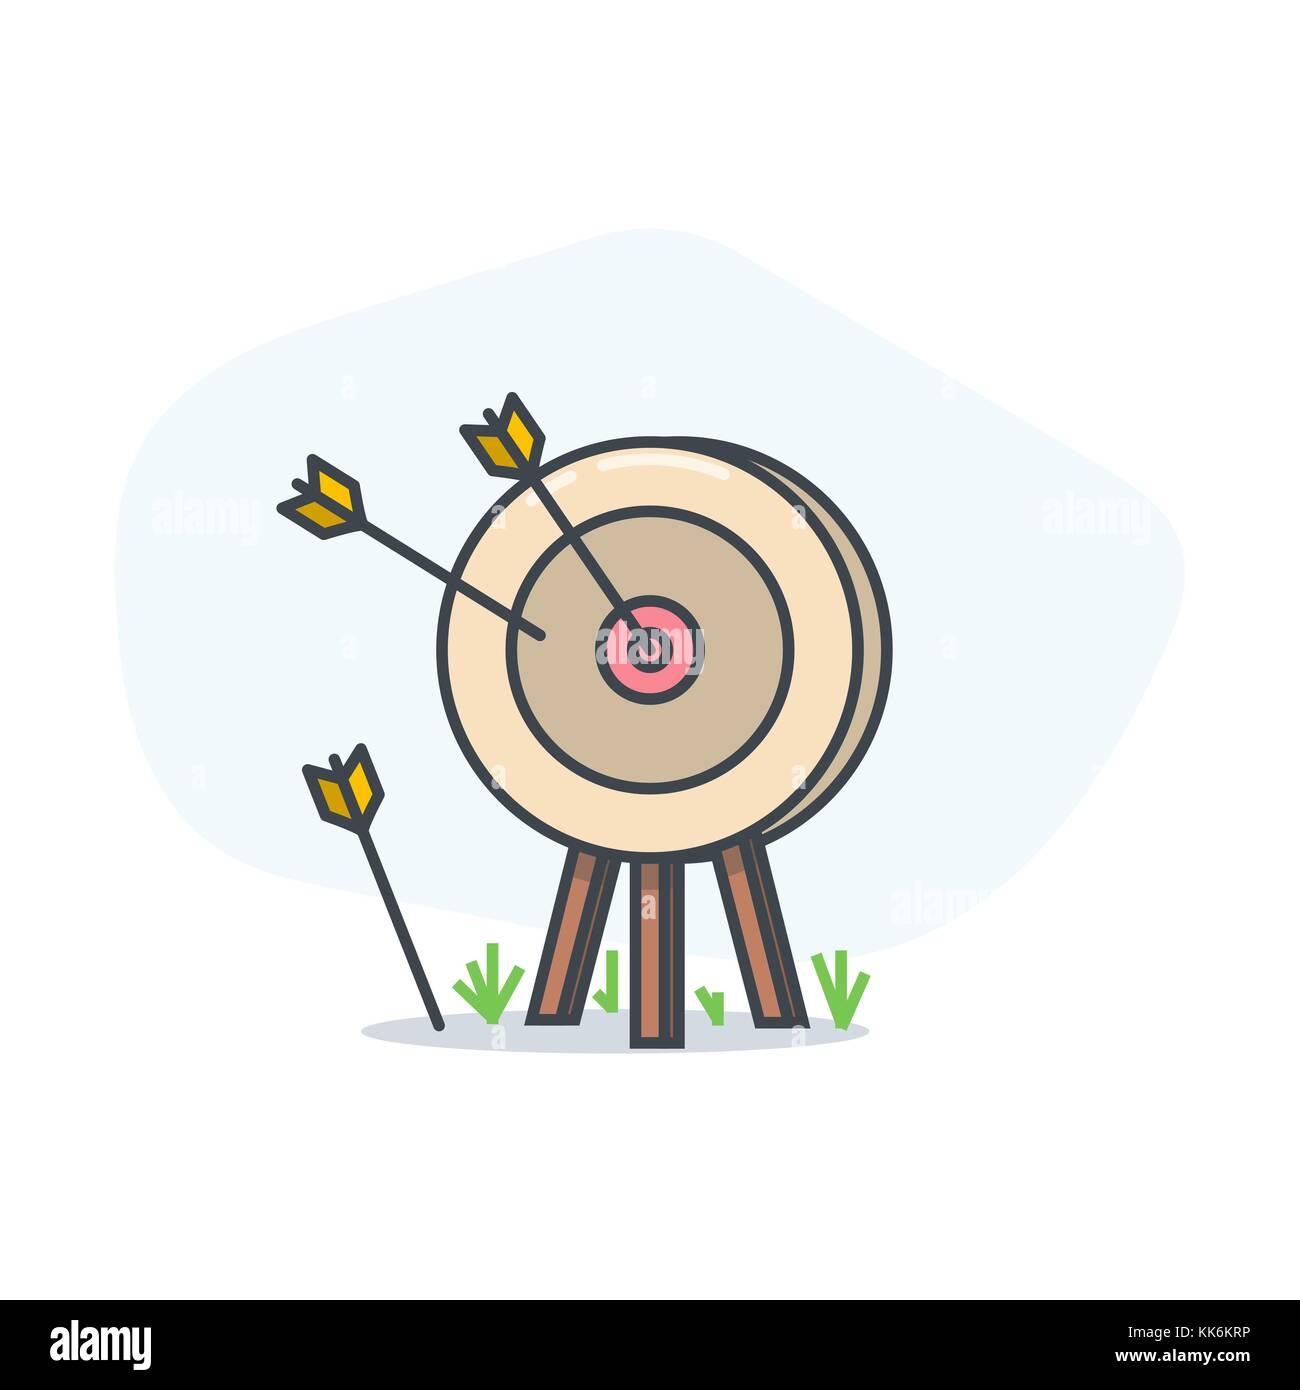 Target and arrow Stock Vector